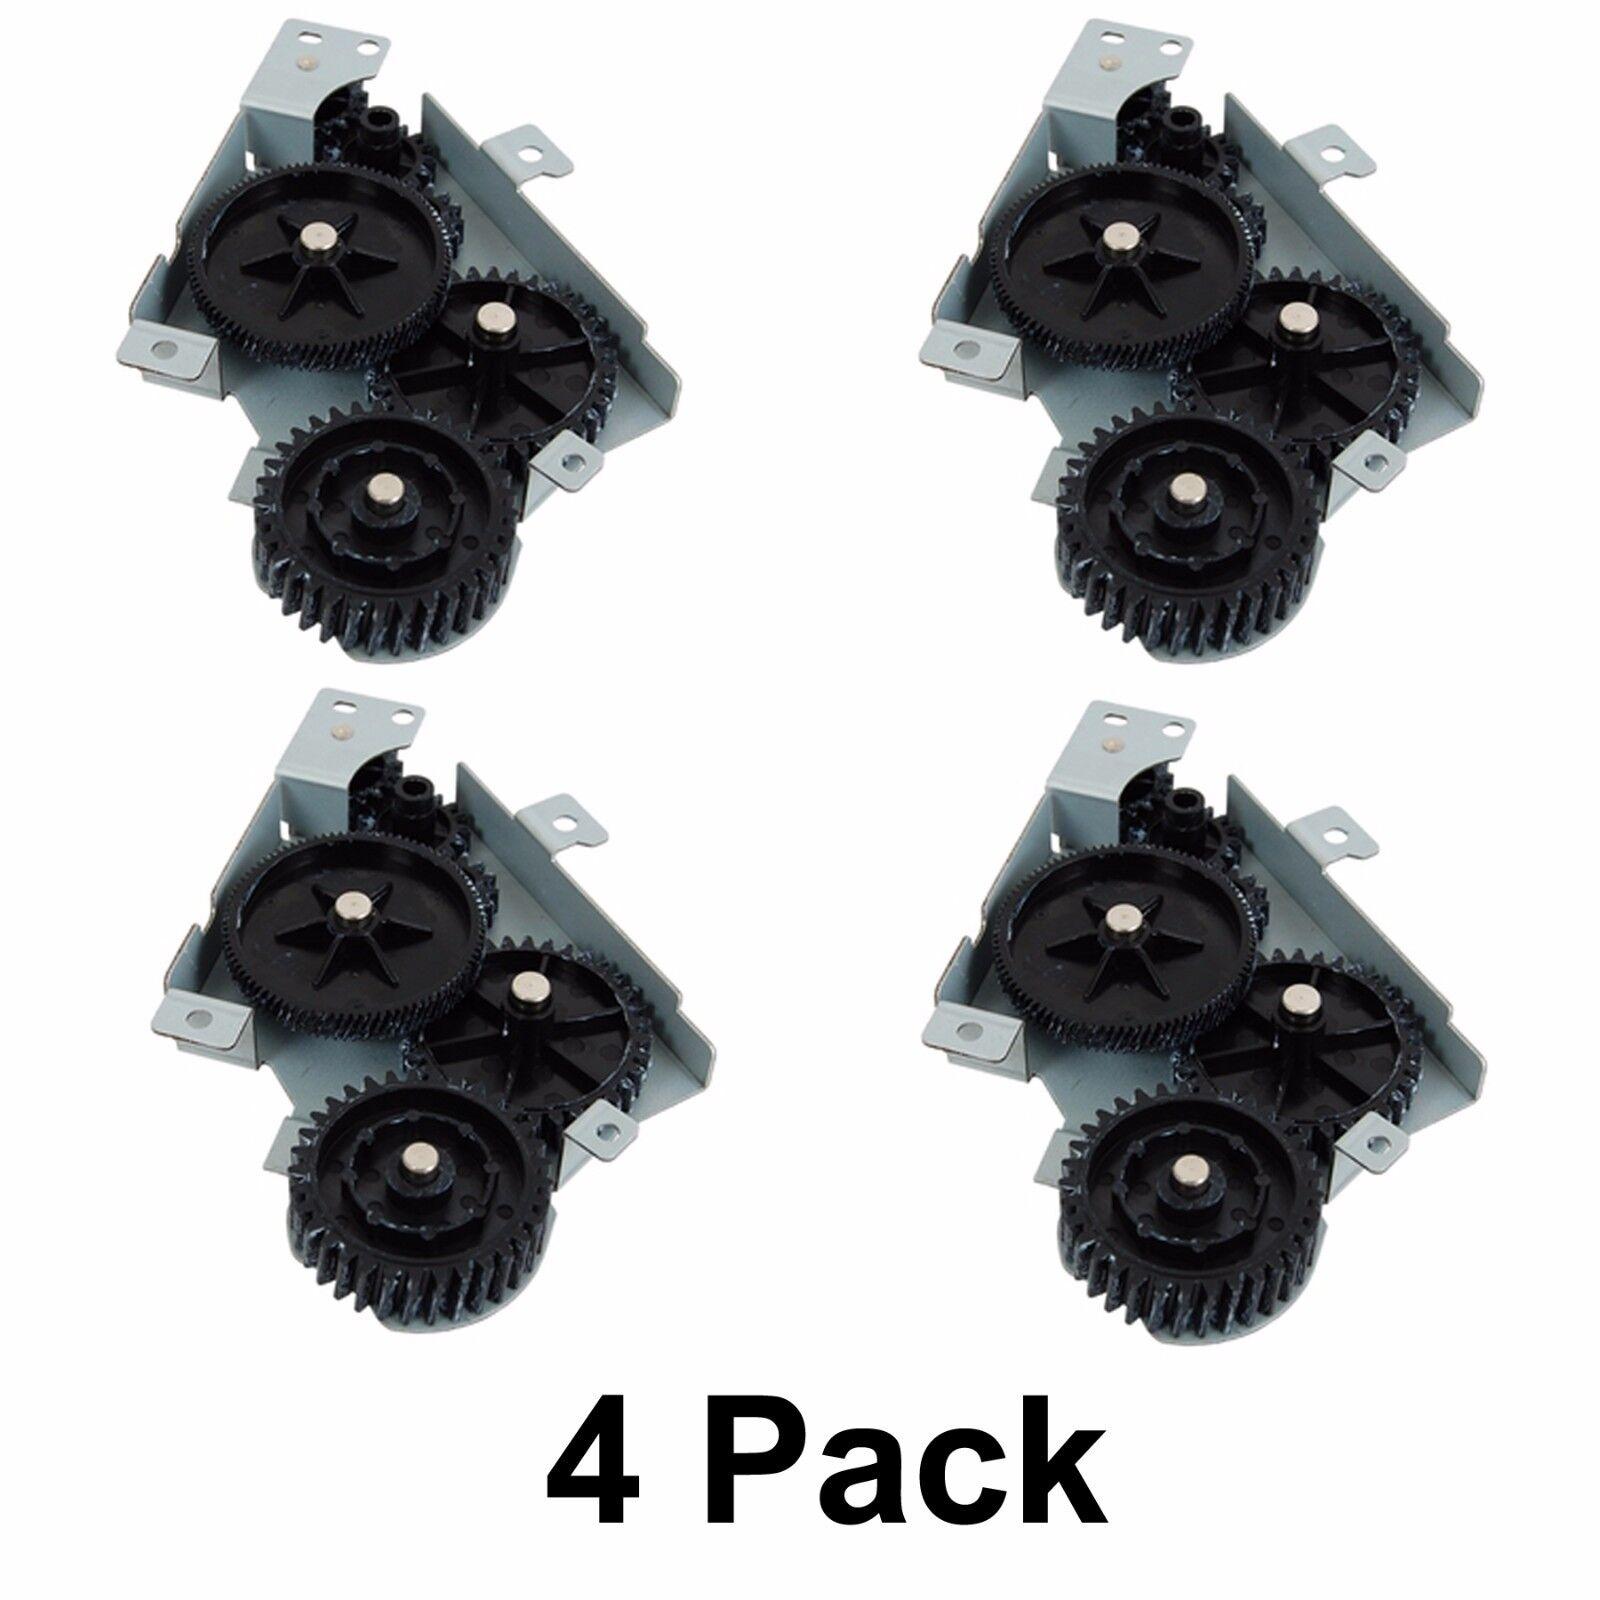 4 HP LaserJet Enterprise 600 M603dn M602x Swing Plat Gear Assembly RC2-2432-M600